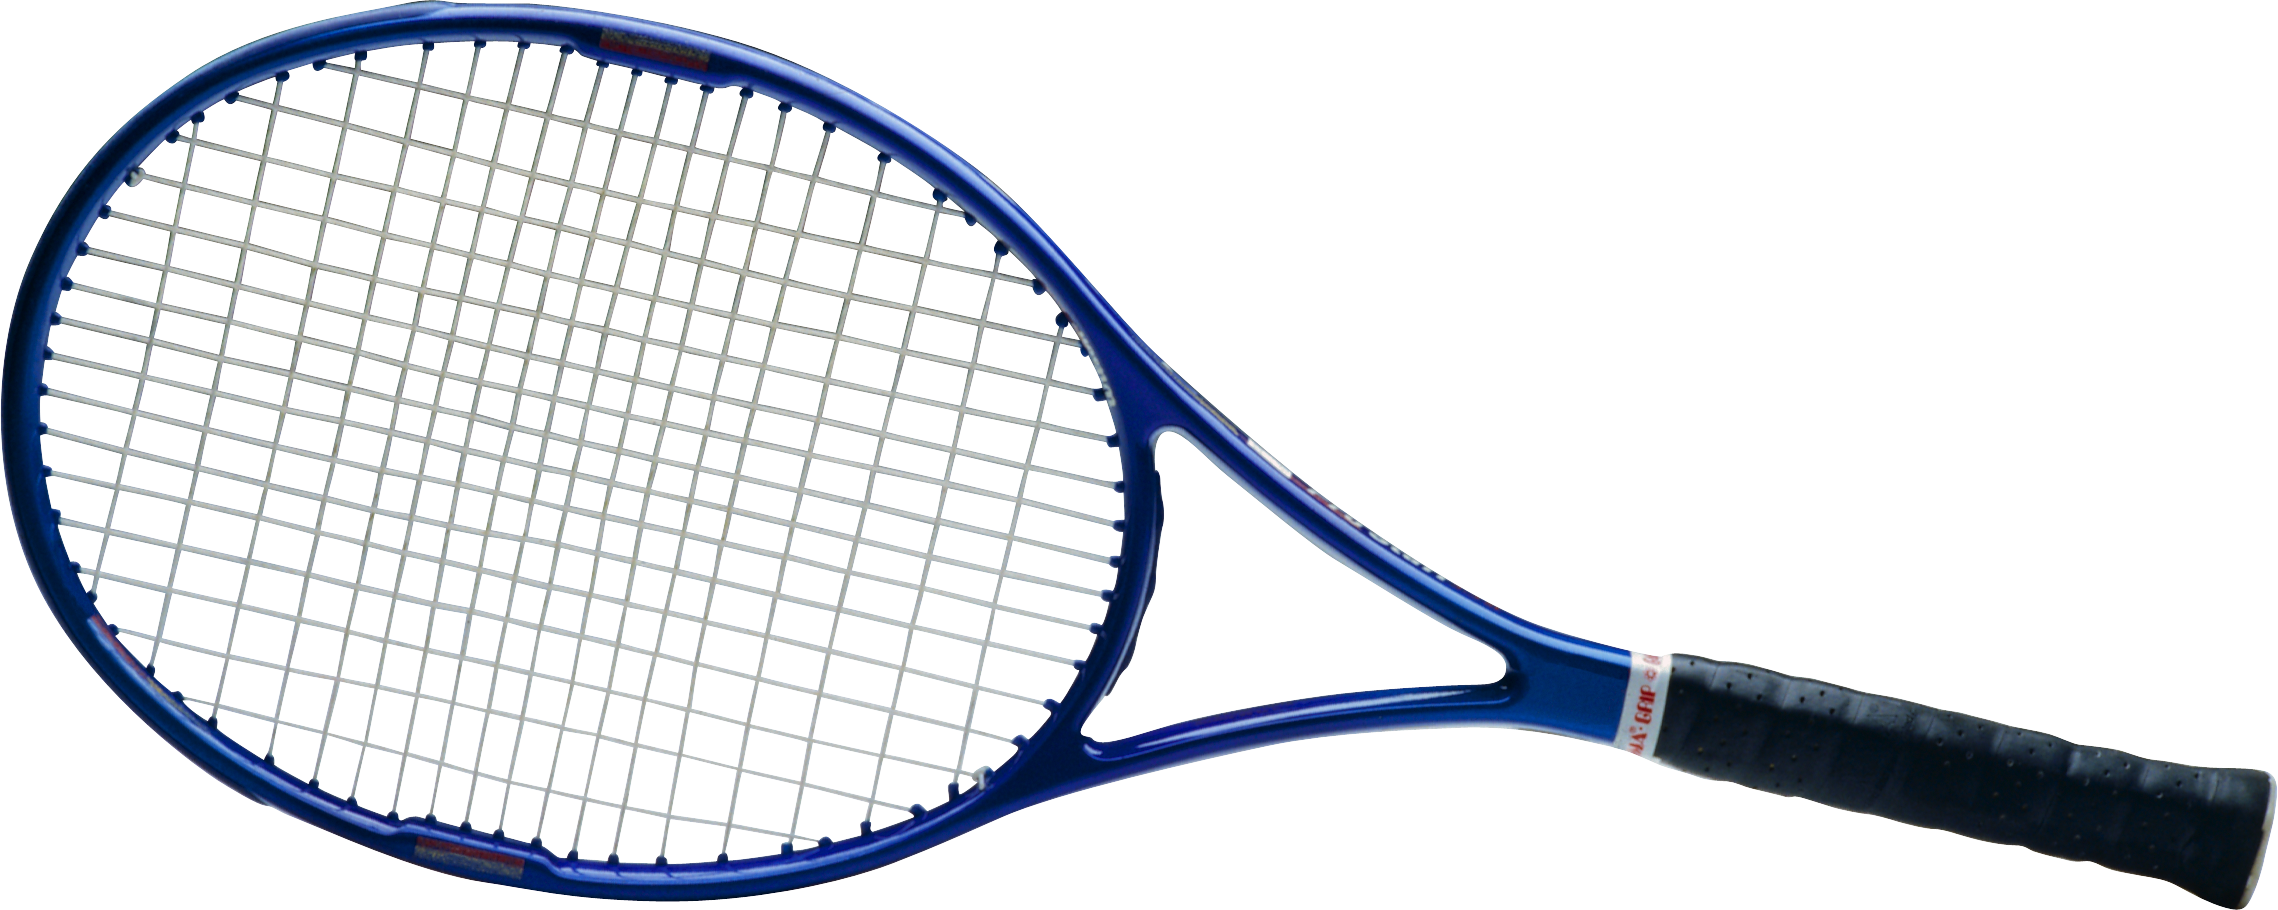 Tennis PNG - 9866